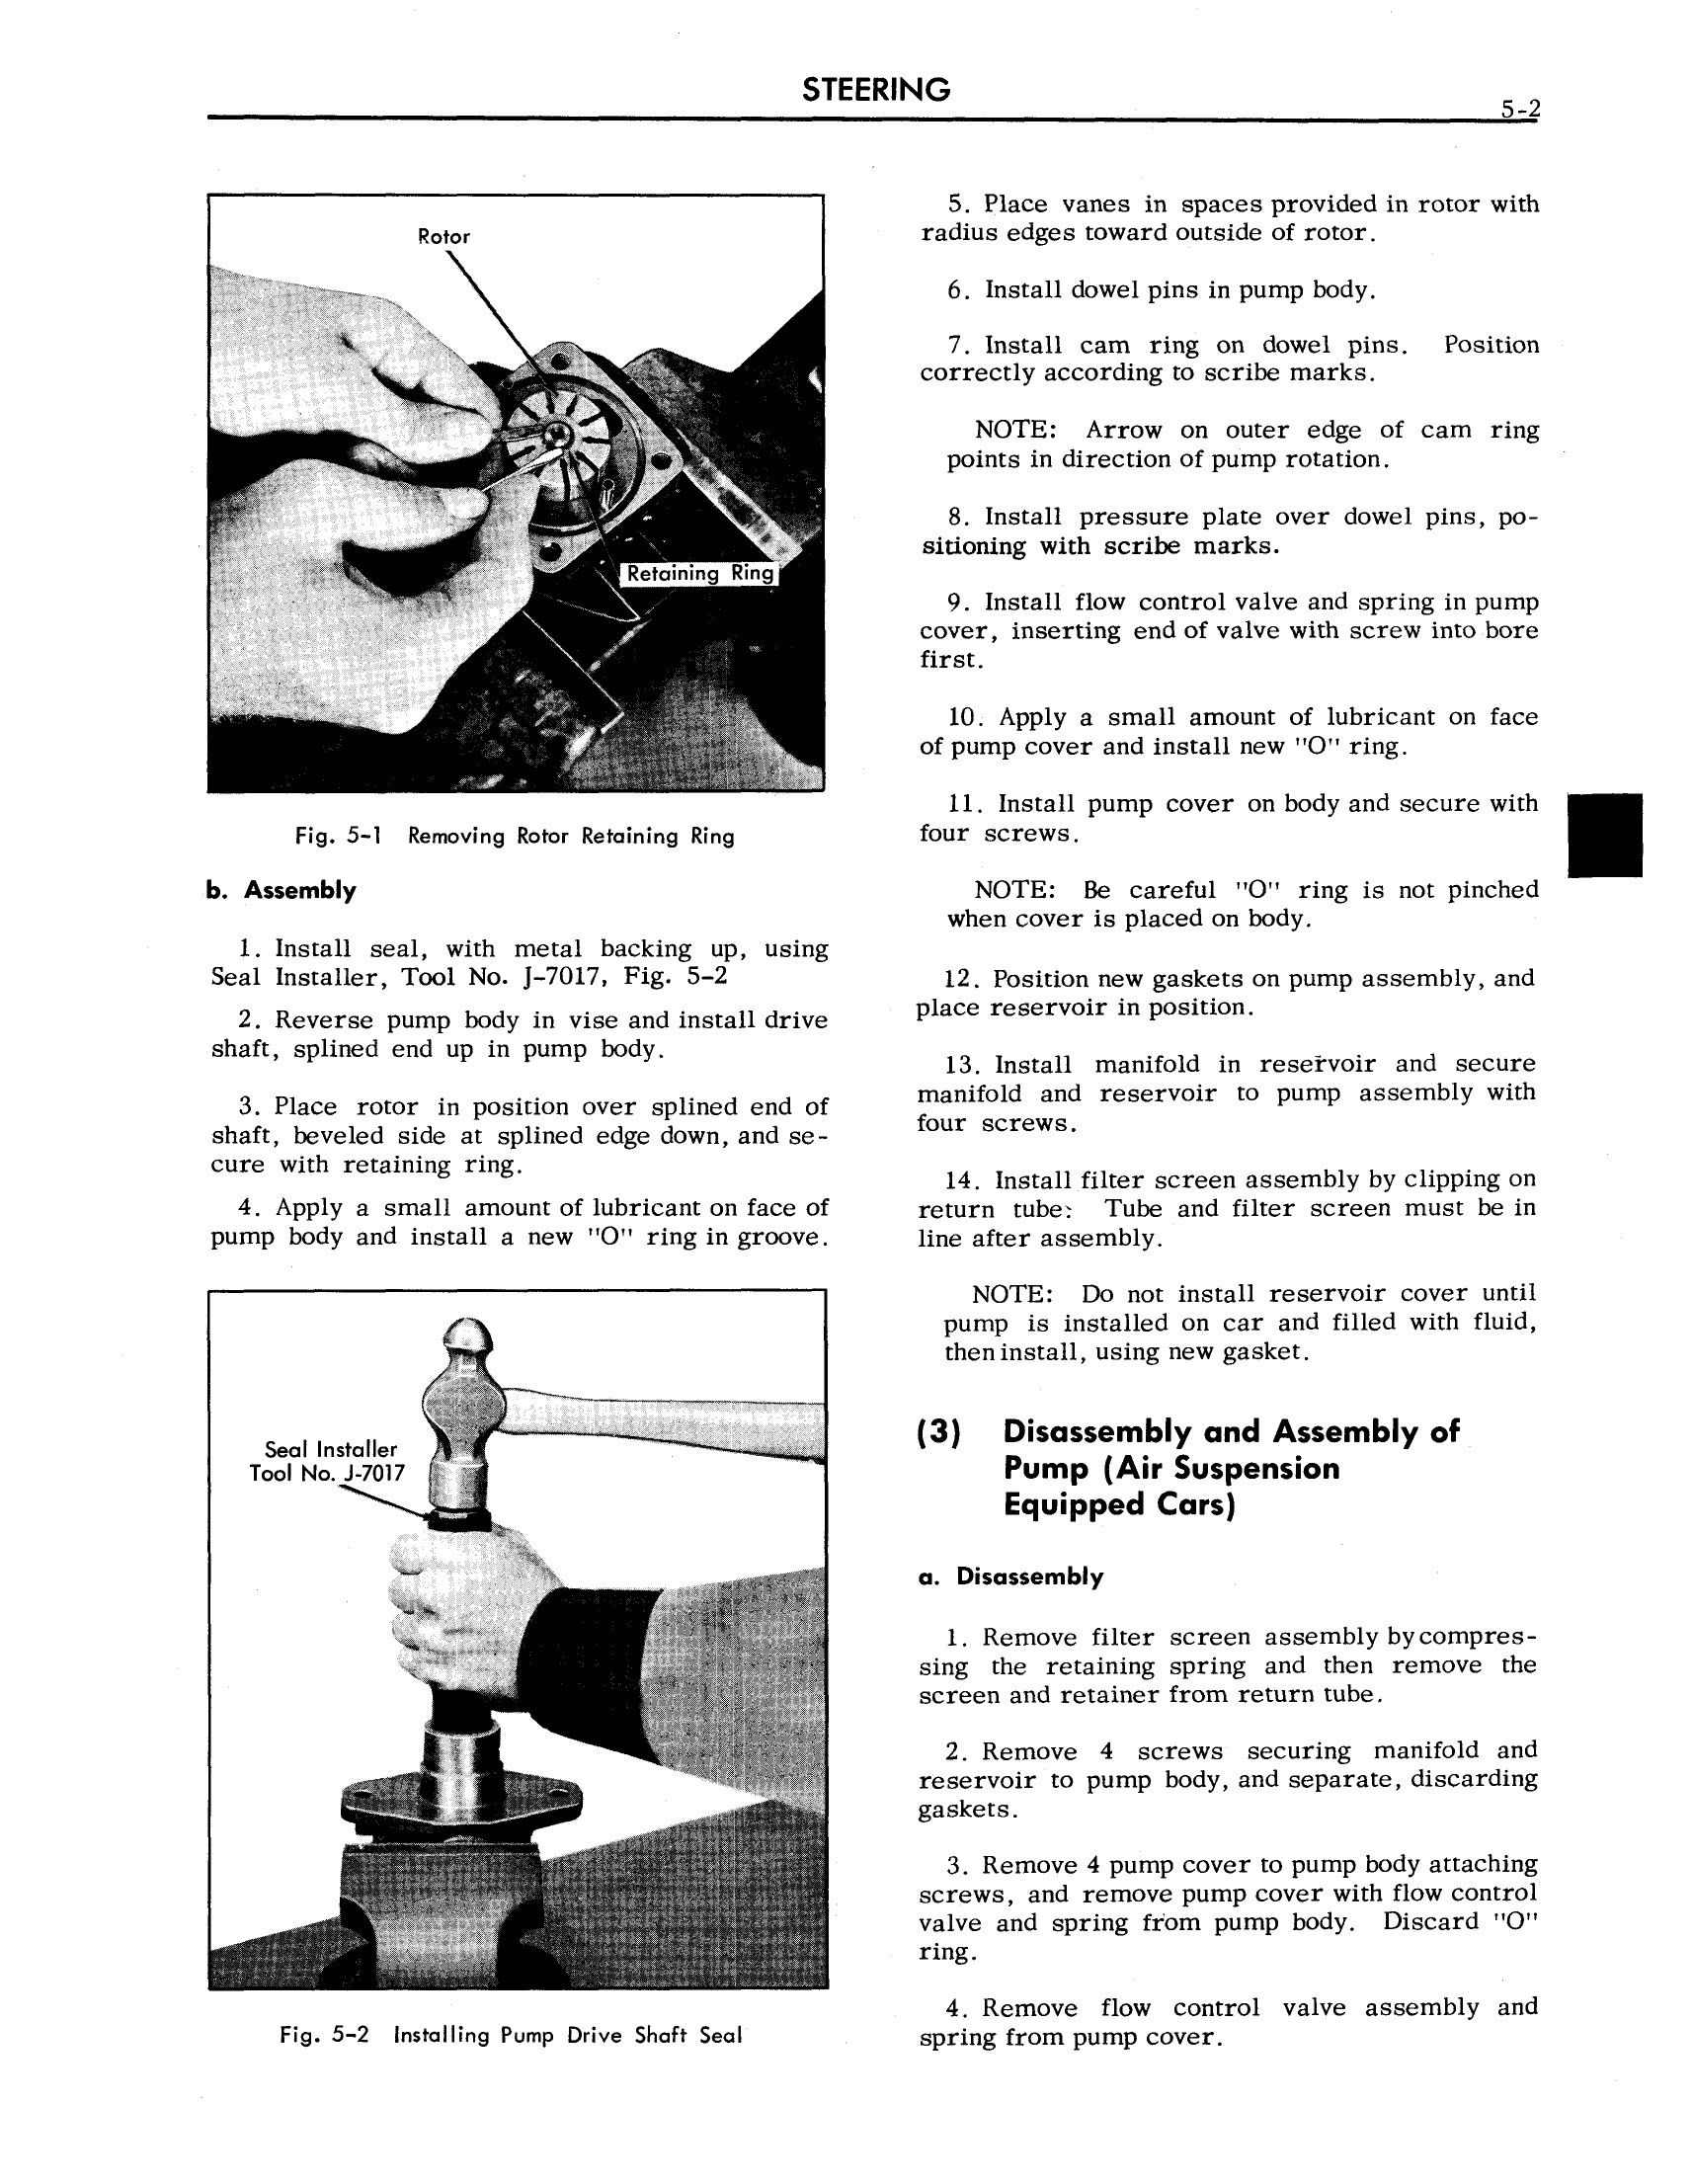 1958 Cadillac Shop Manual- Steering Page 2 of 4